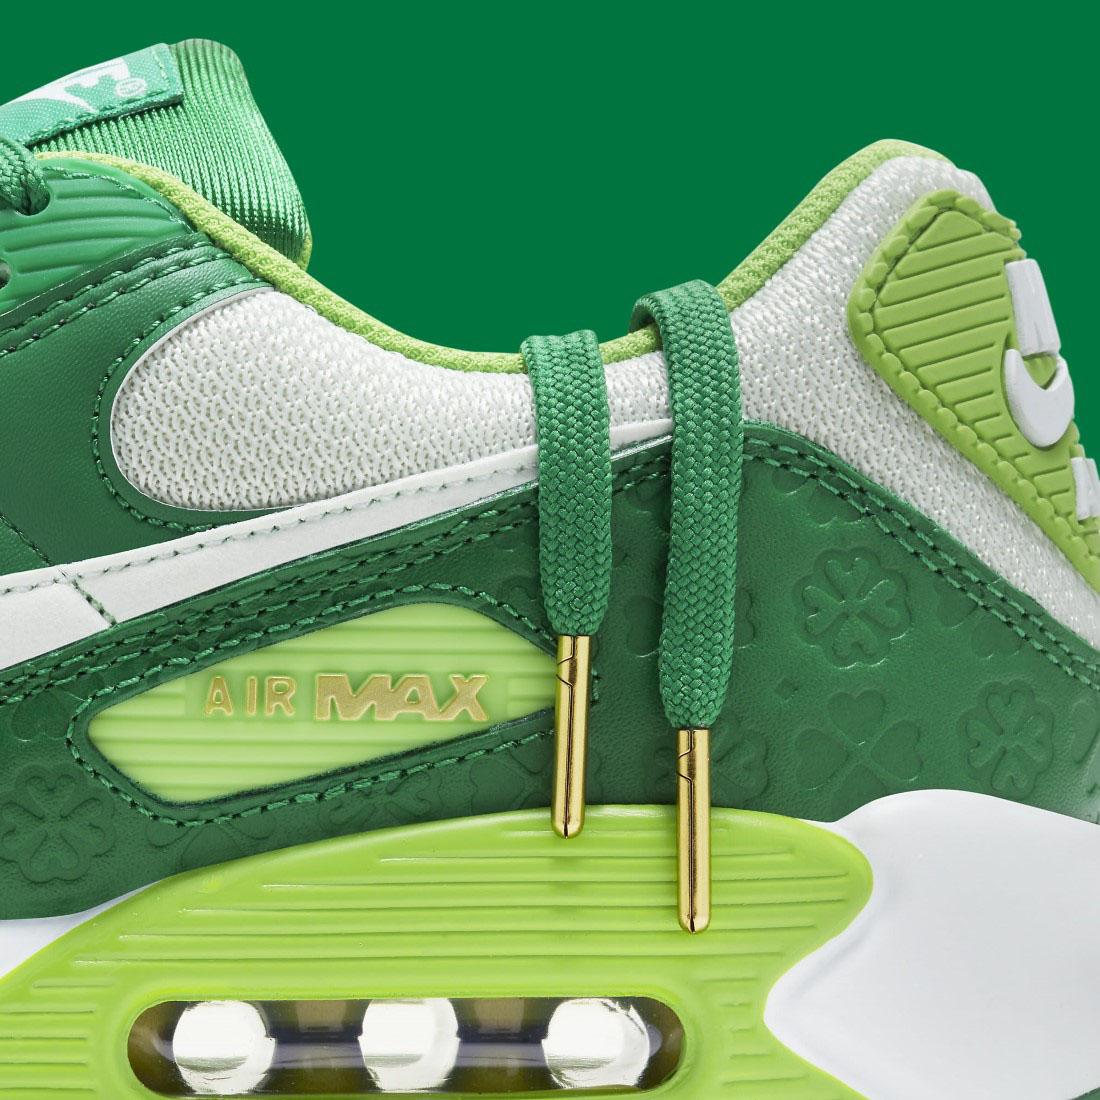 Nike Air Max 90 St. Patrick Day 2021